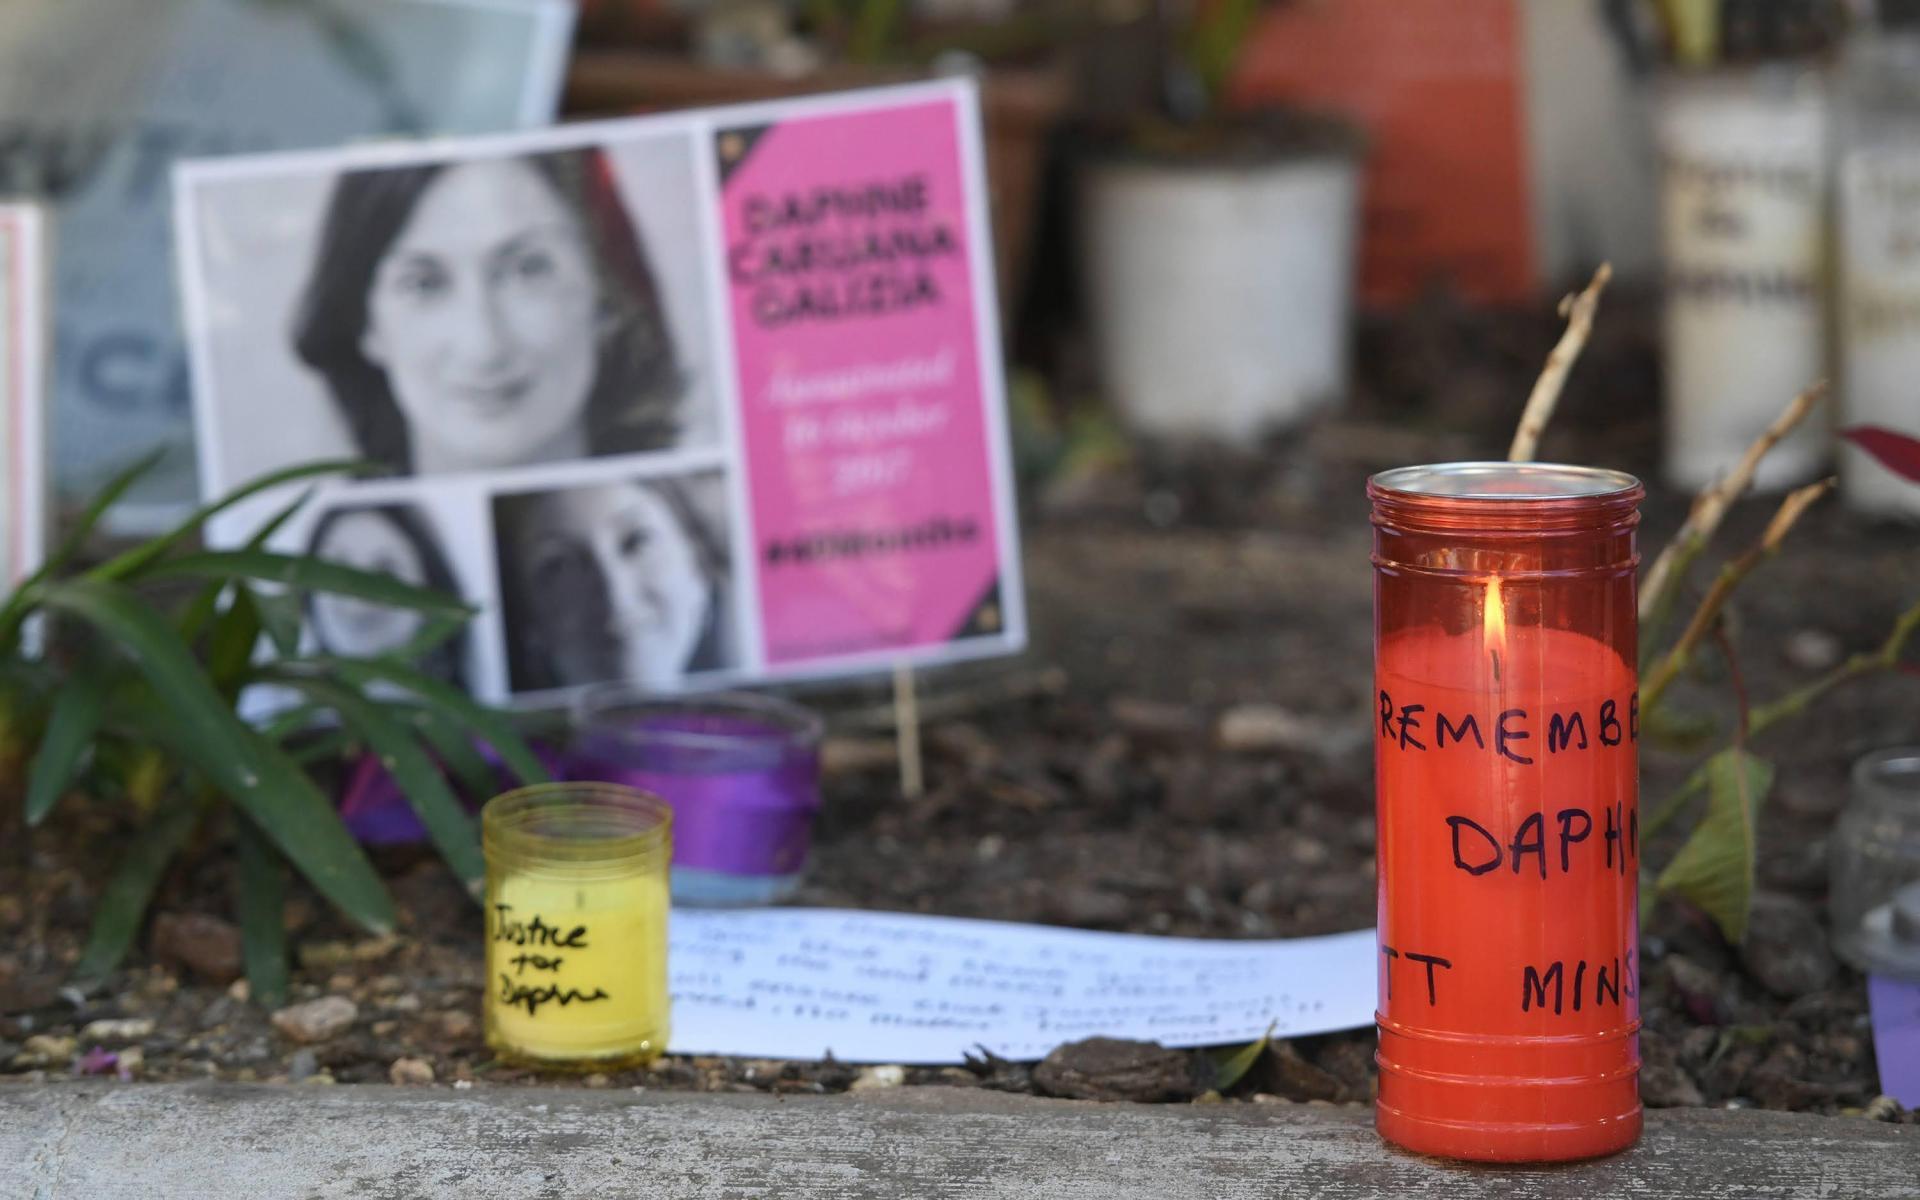 Daphne Caruana Galizia was killed in a car bomb in October 2017. File photo, Matthew Mirabelli